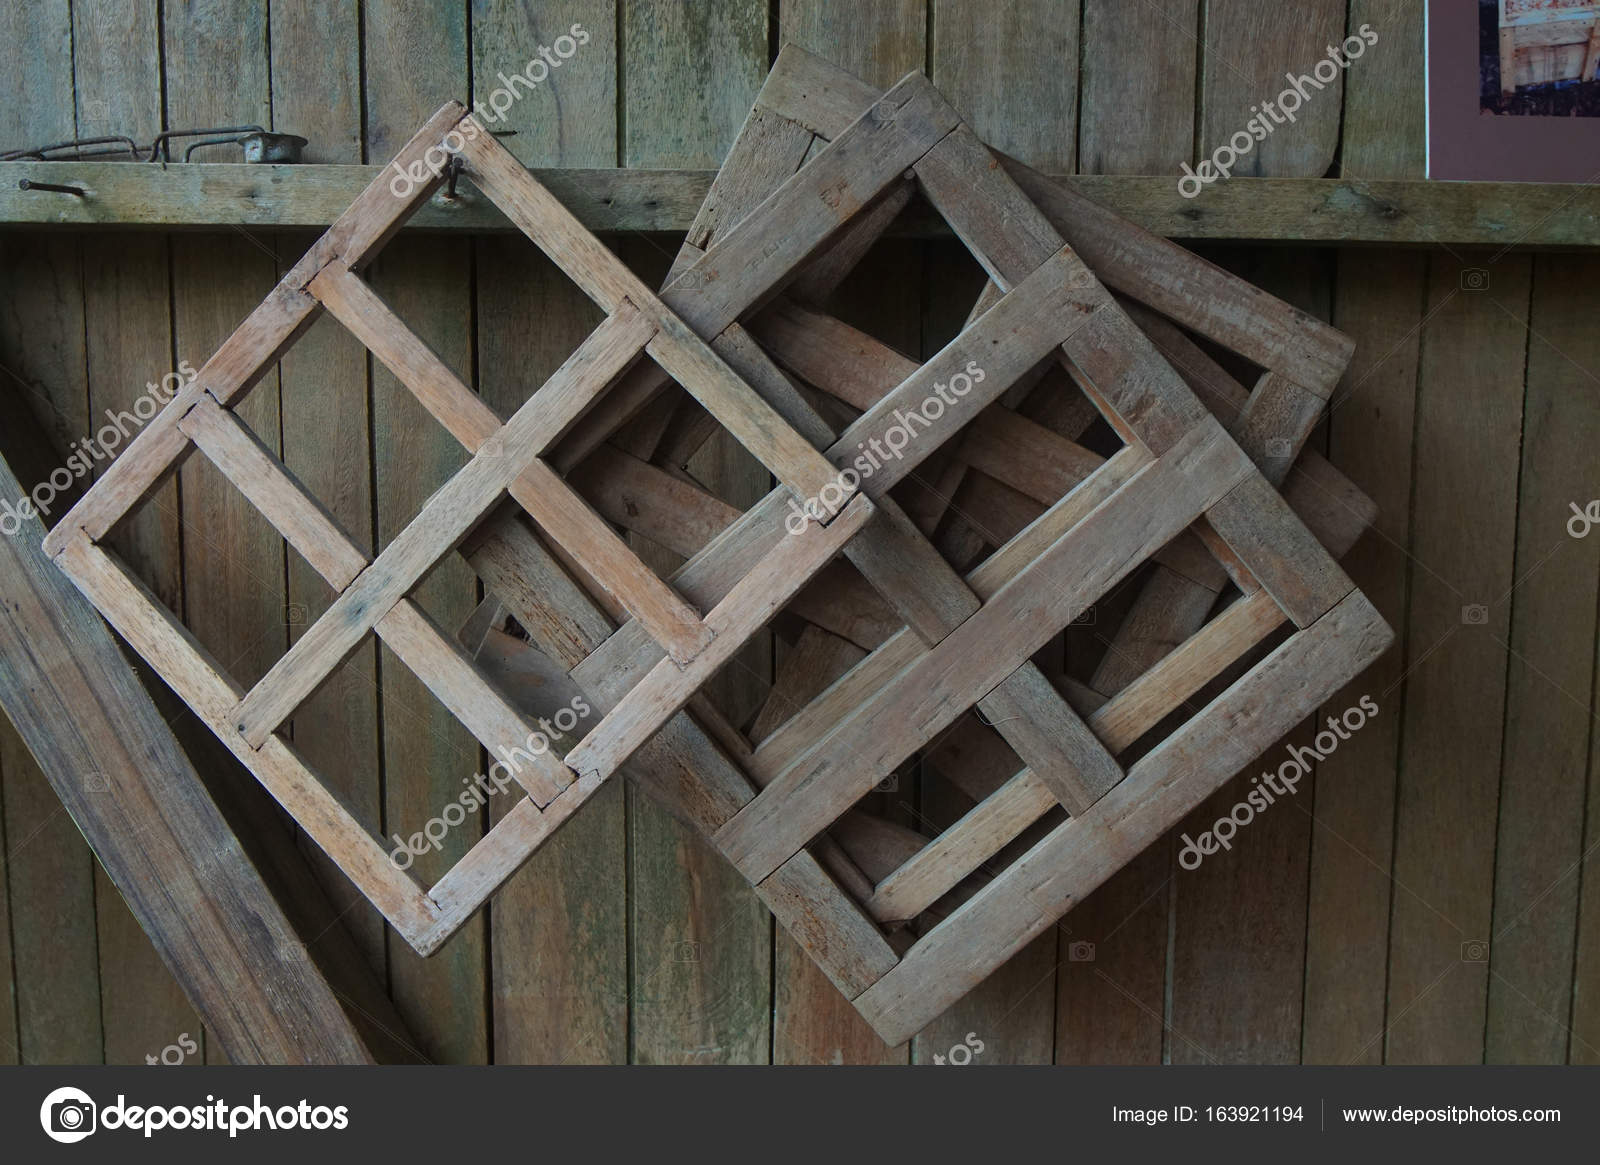 Marcos de madera rústicos utilizados para moldear bloques de ...